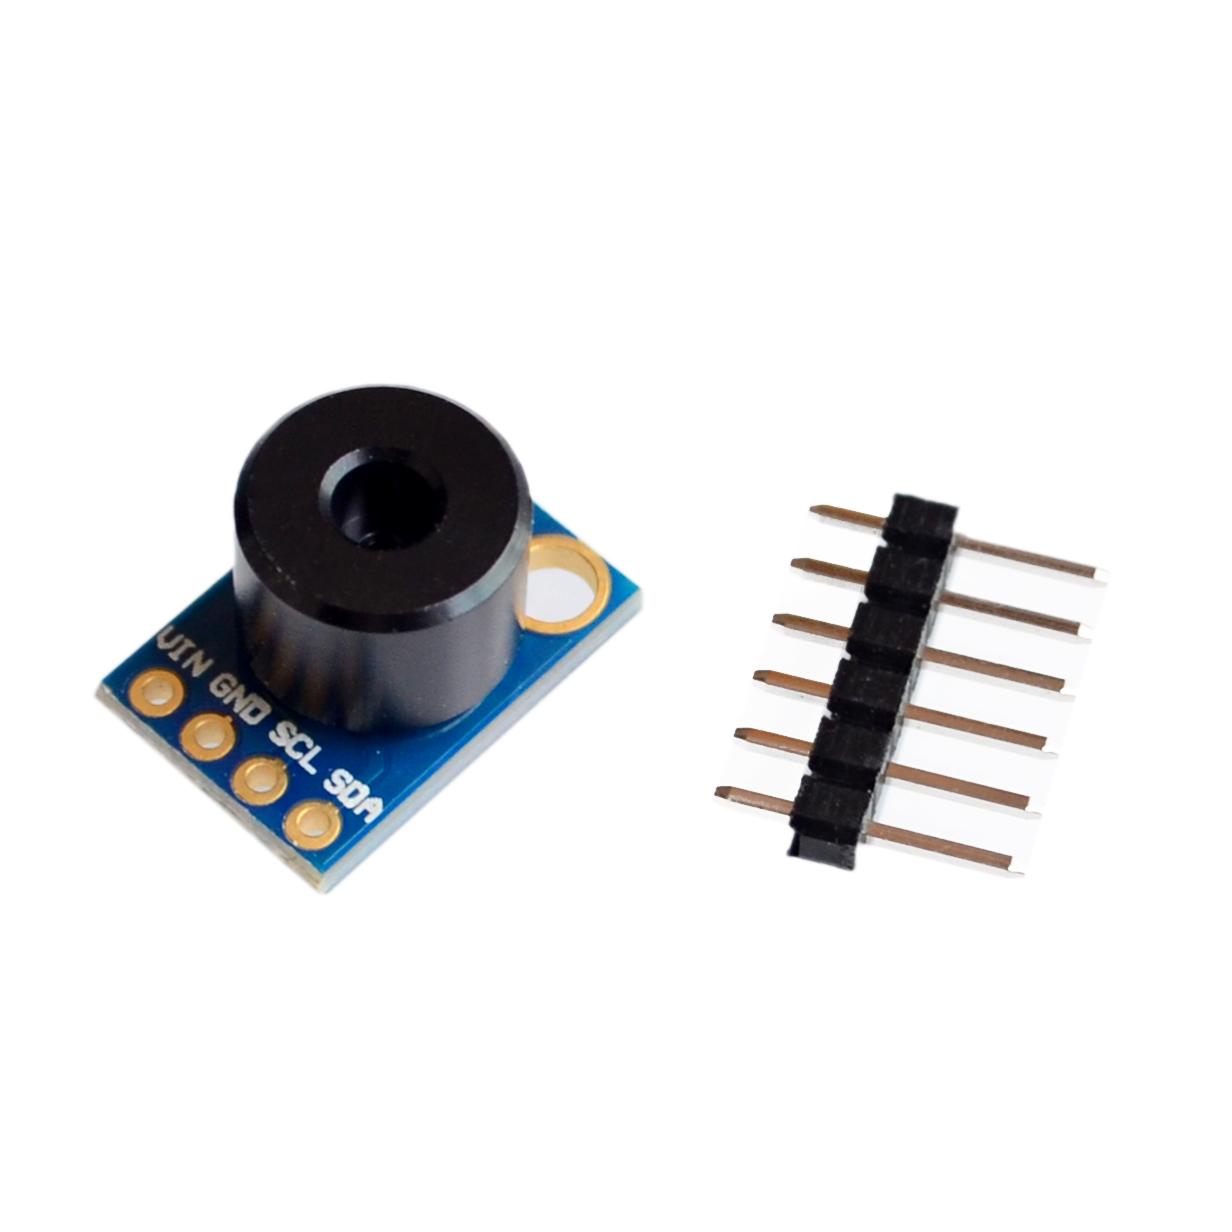 GY-906 Infrared Temperature Sensor Module MLX90614ESF เซ็นเซอร์อุณหภูมิแบบไร้สัมผัส